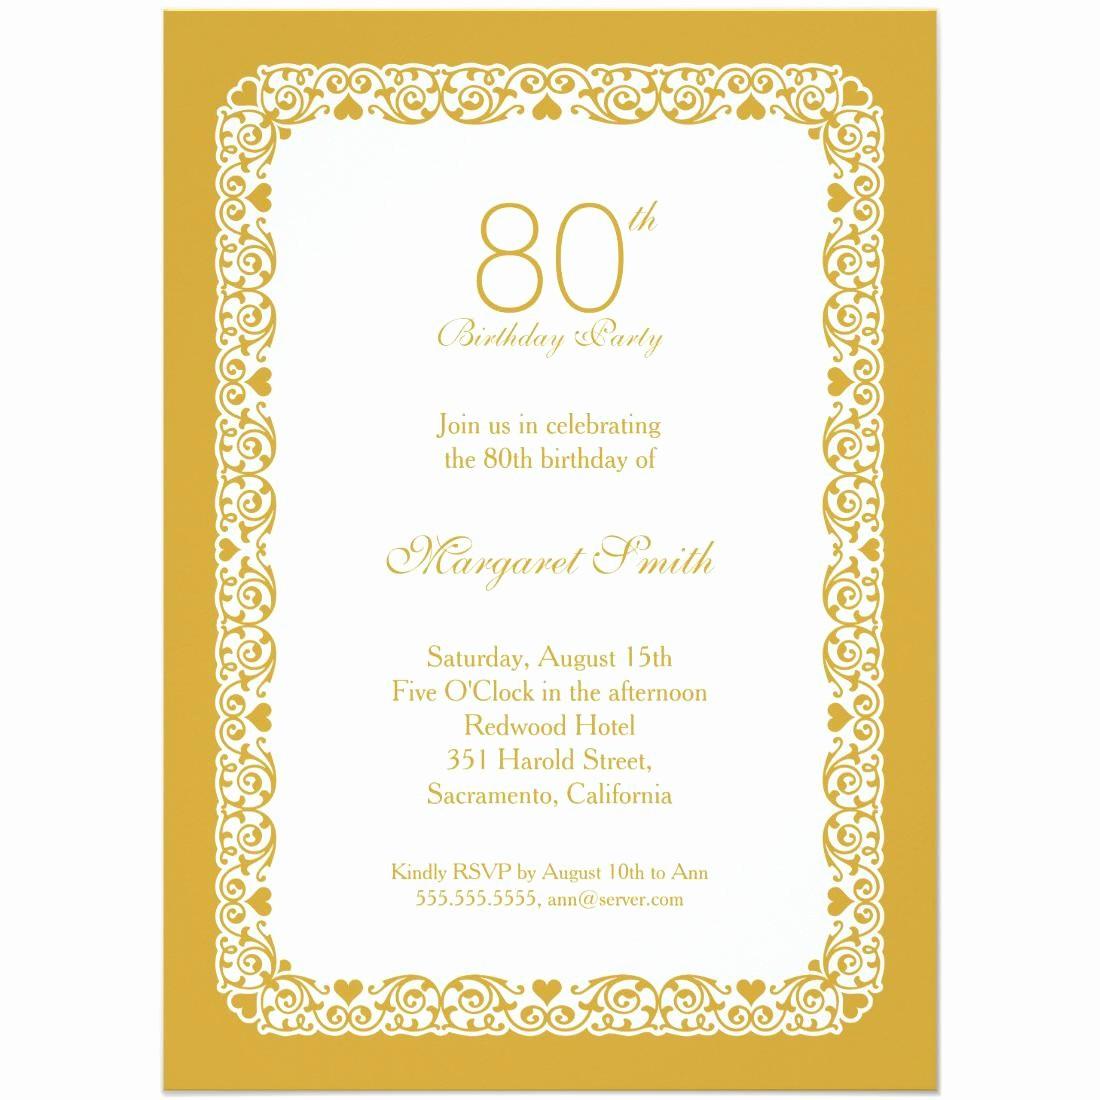 Invitation format for Birthday Party Unique 15 Sample 80th Birthday Invitations Templates Ideas